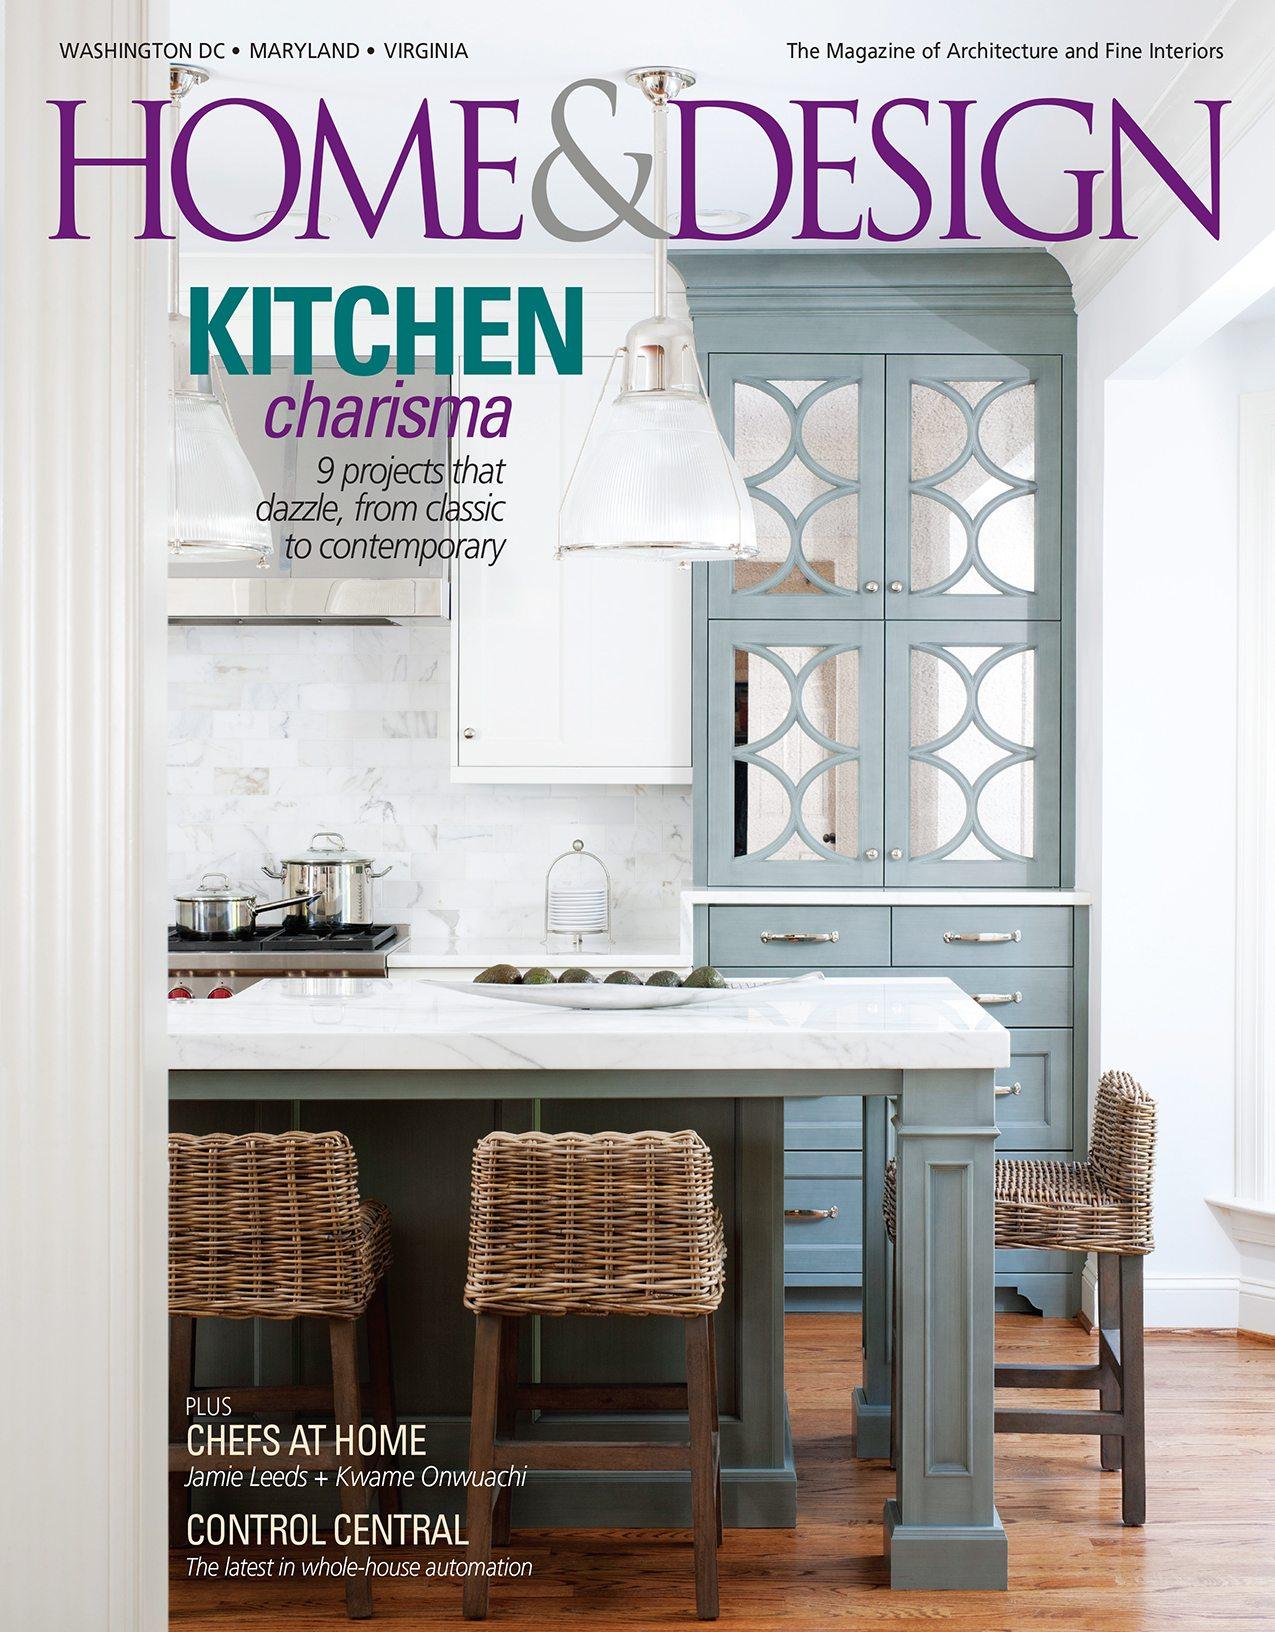 January February 2017 Archives Home & Design Magazine